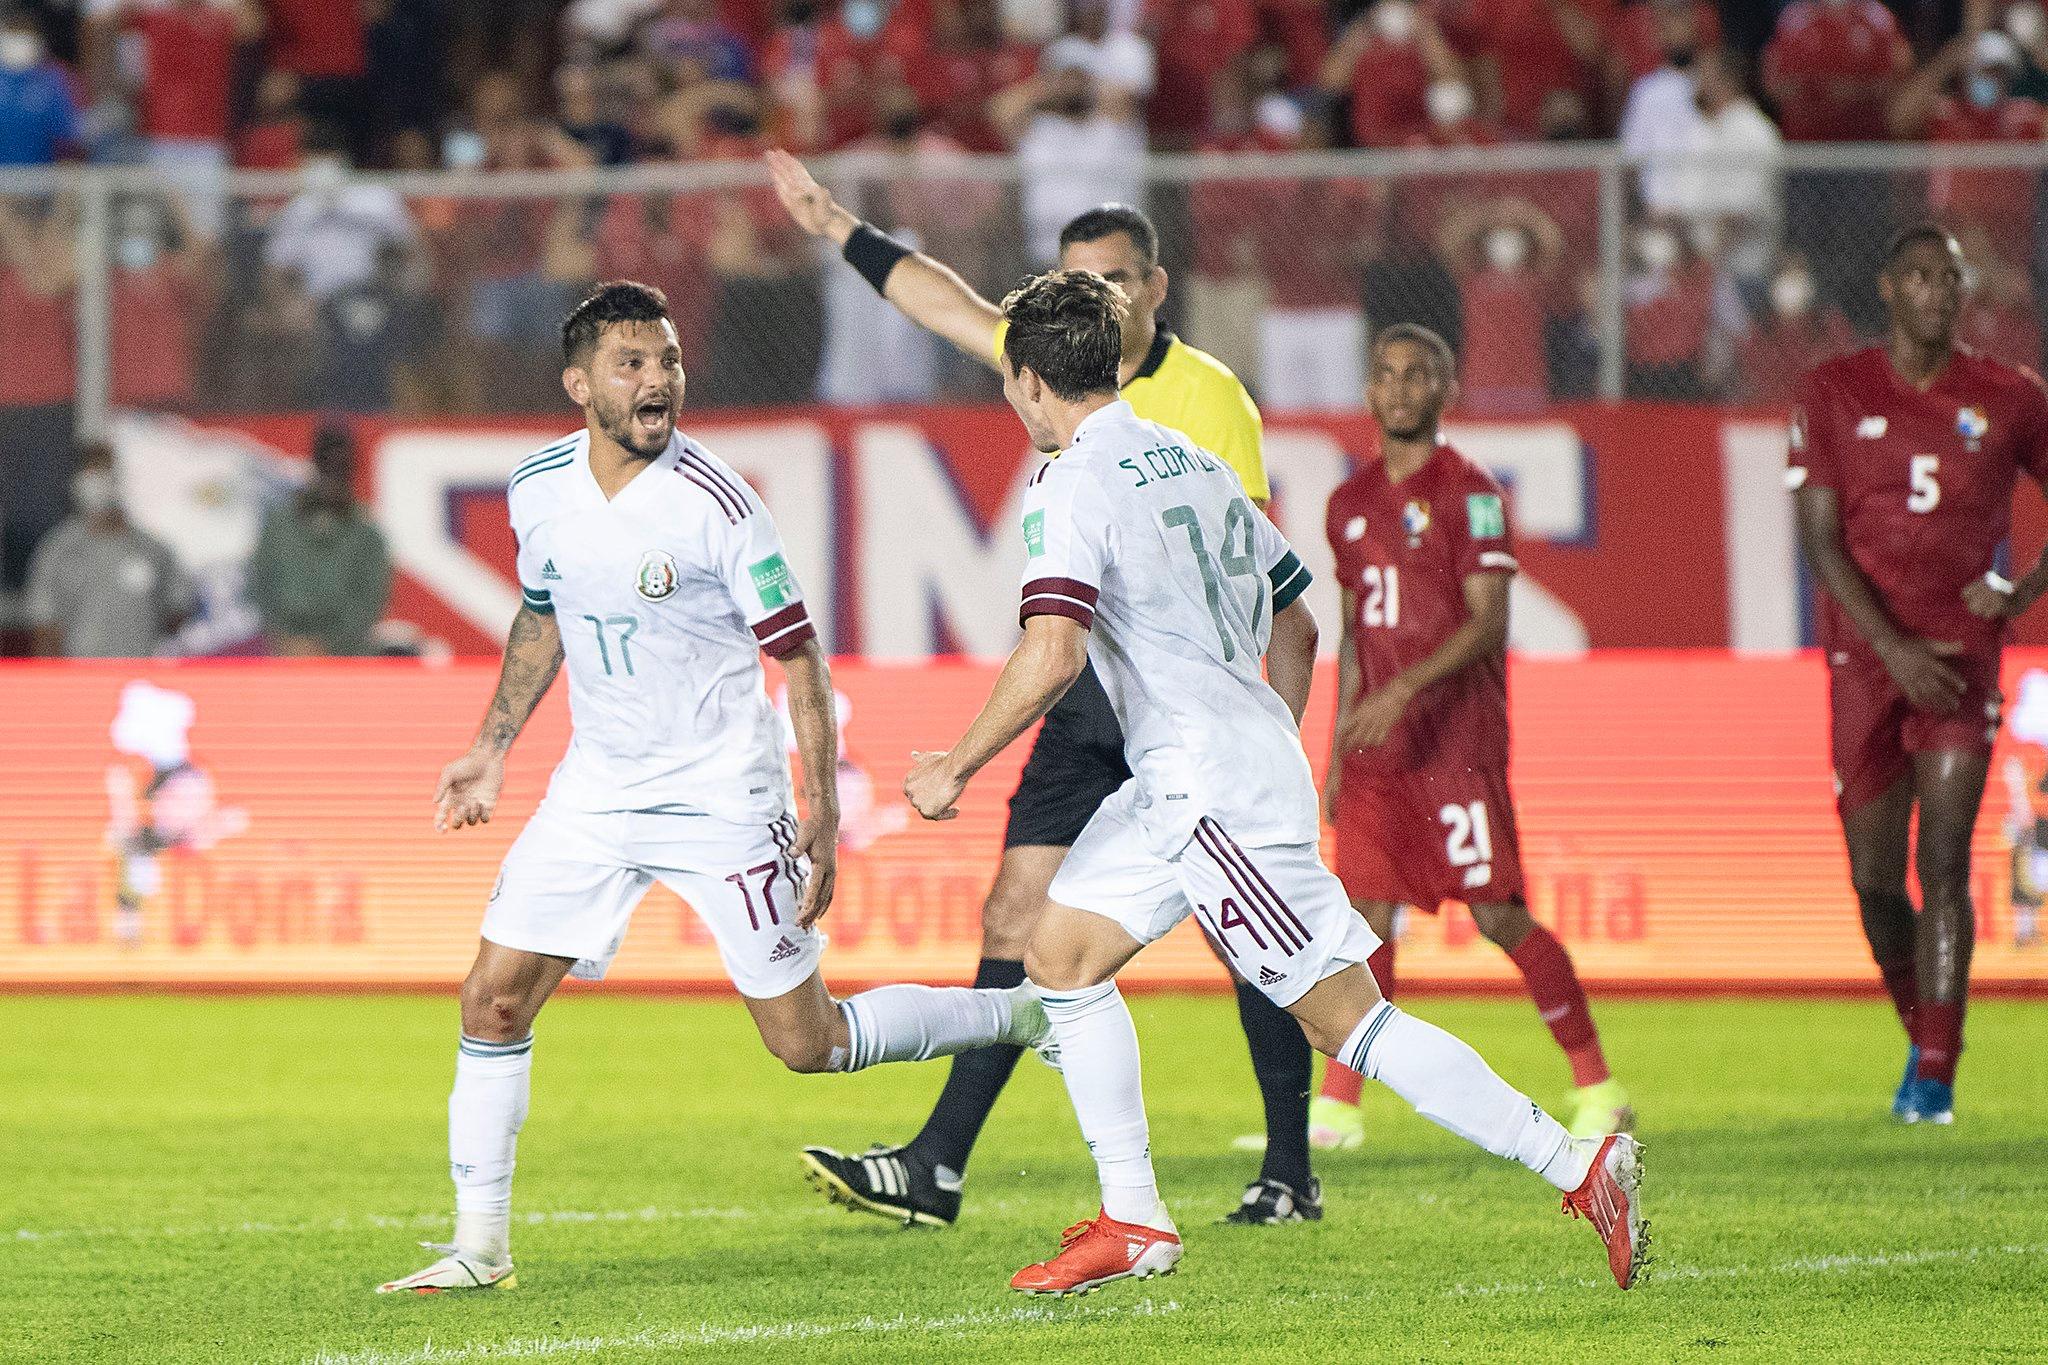 Eliminatorias CONCACAF: México divide puntos con Panamá